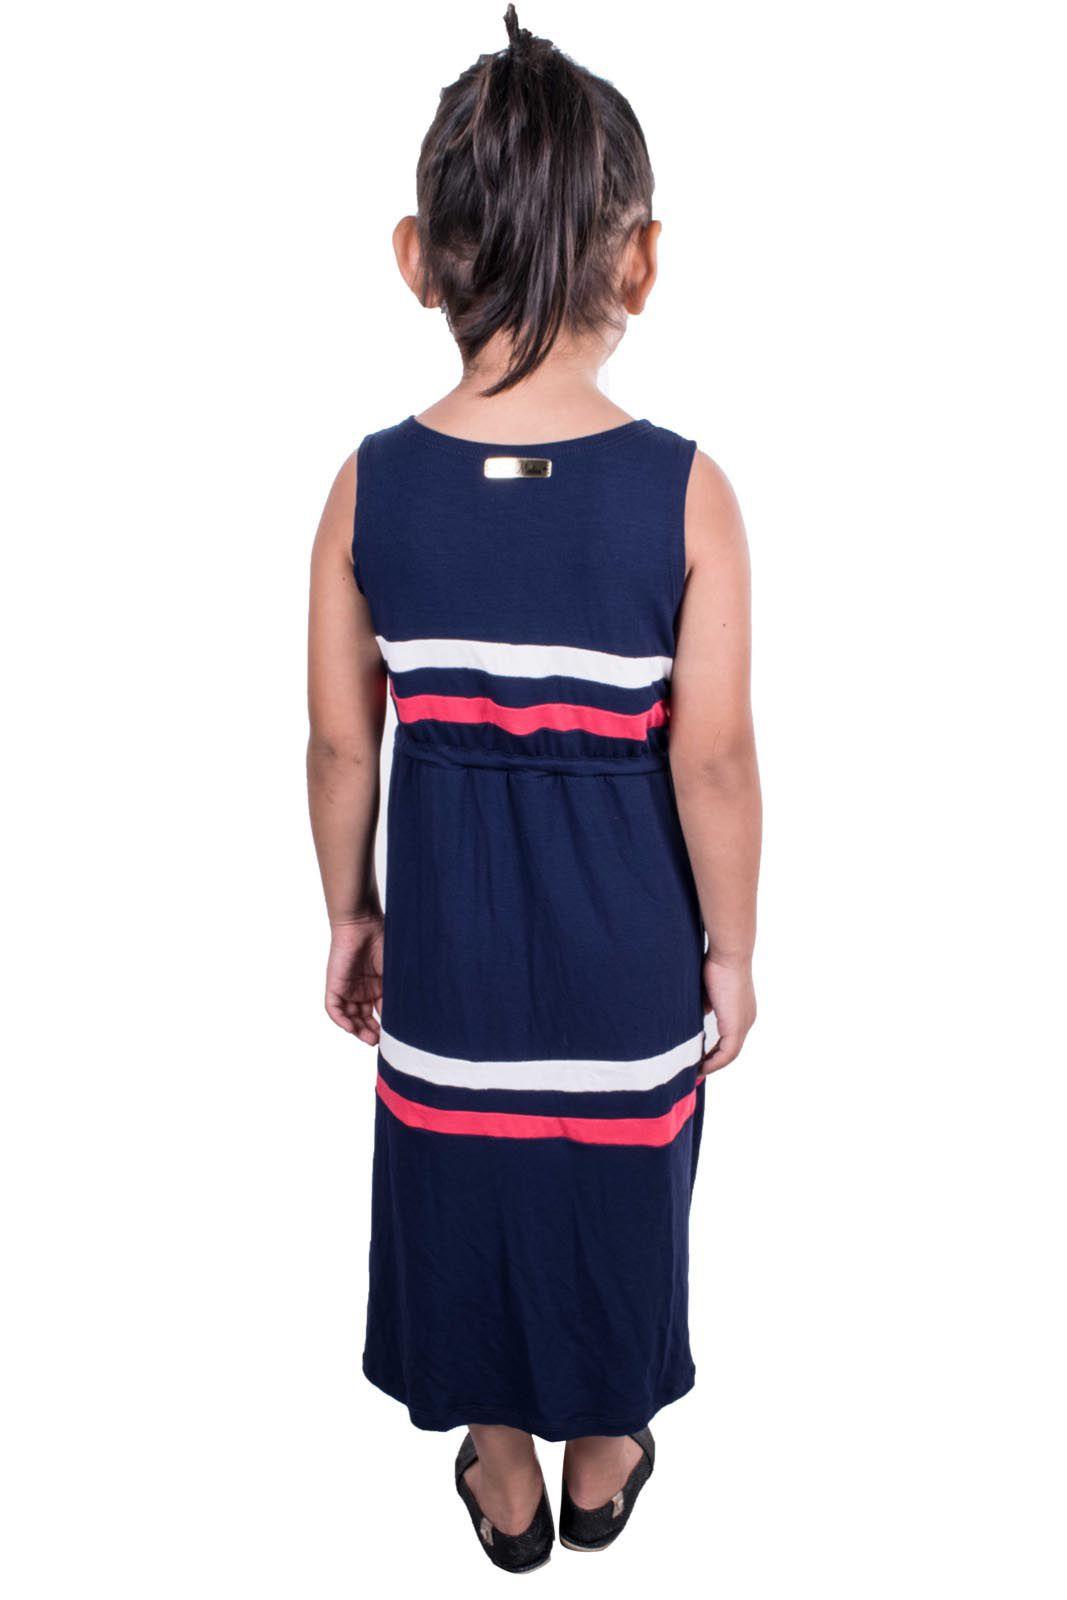 Vestido Outlet Dri Infantil Detalhe 3 Cores Listras Tiras Amarrar Azul